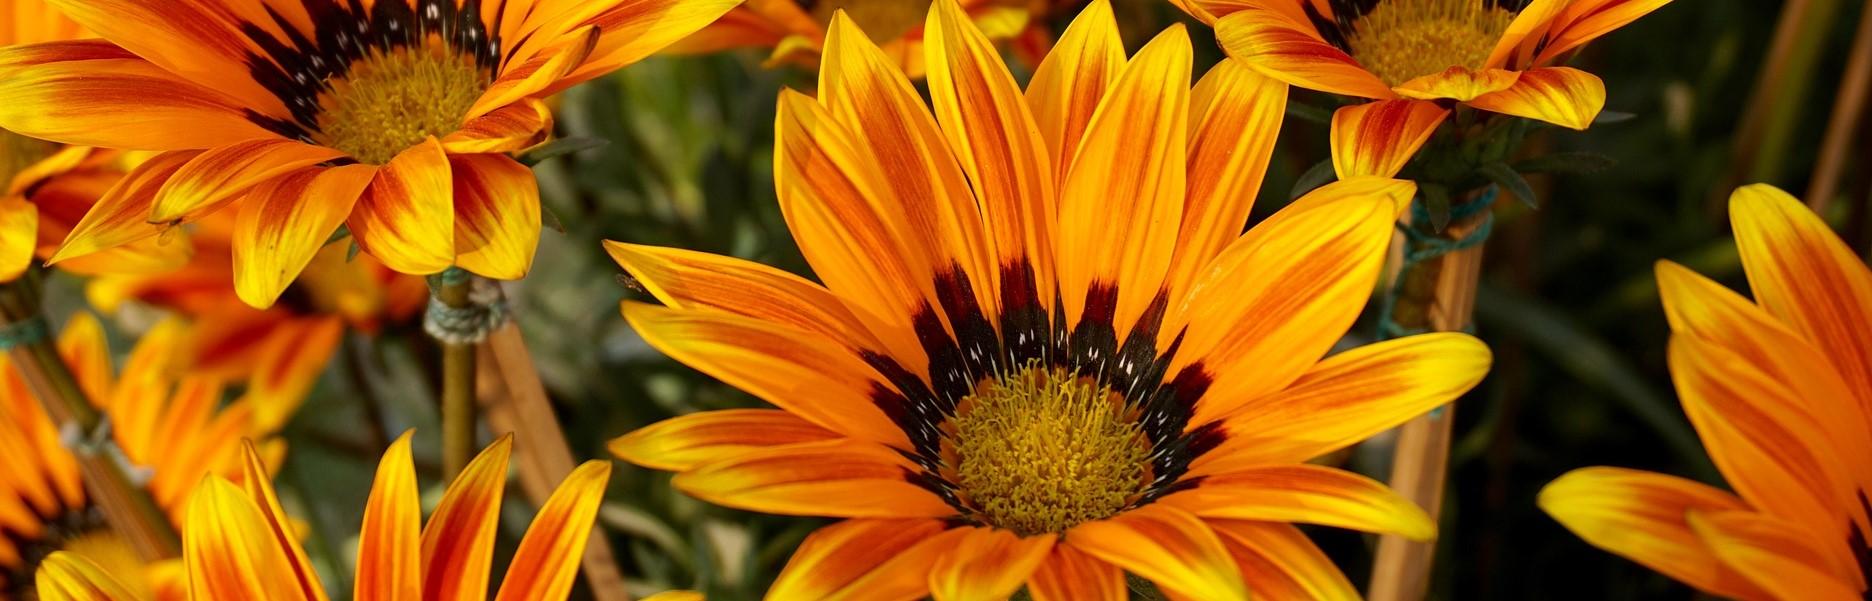 Blumen_Pexels-auf-pixabayJCeHZ8iqmyIzP